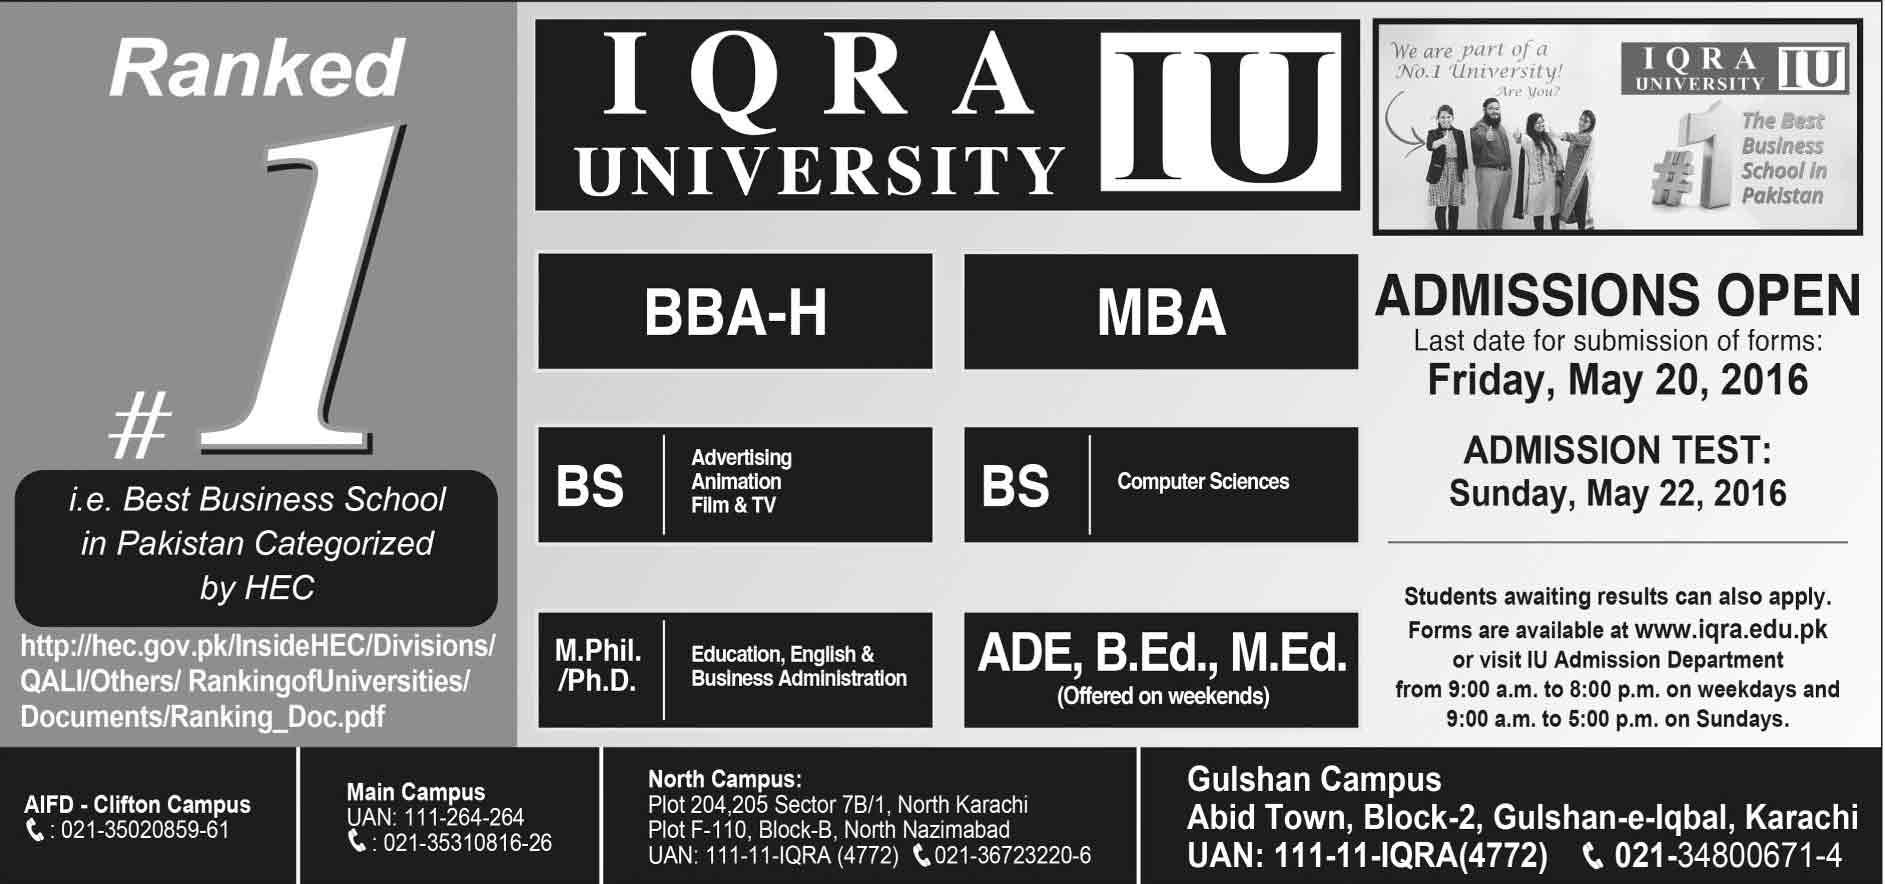 Iqra University Karachi Admission 2016 Form, Last Date